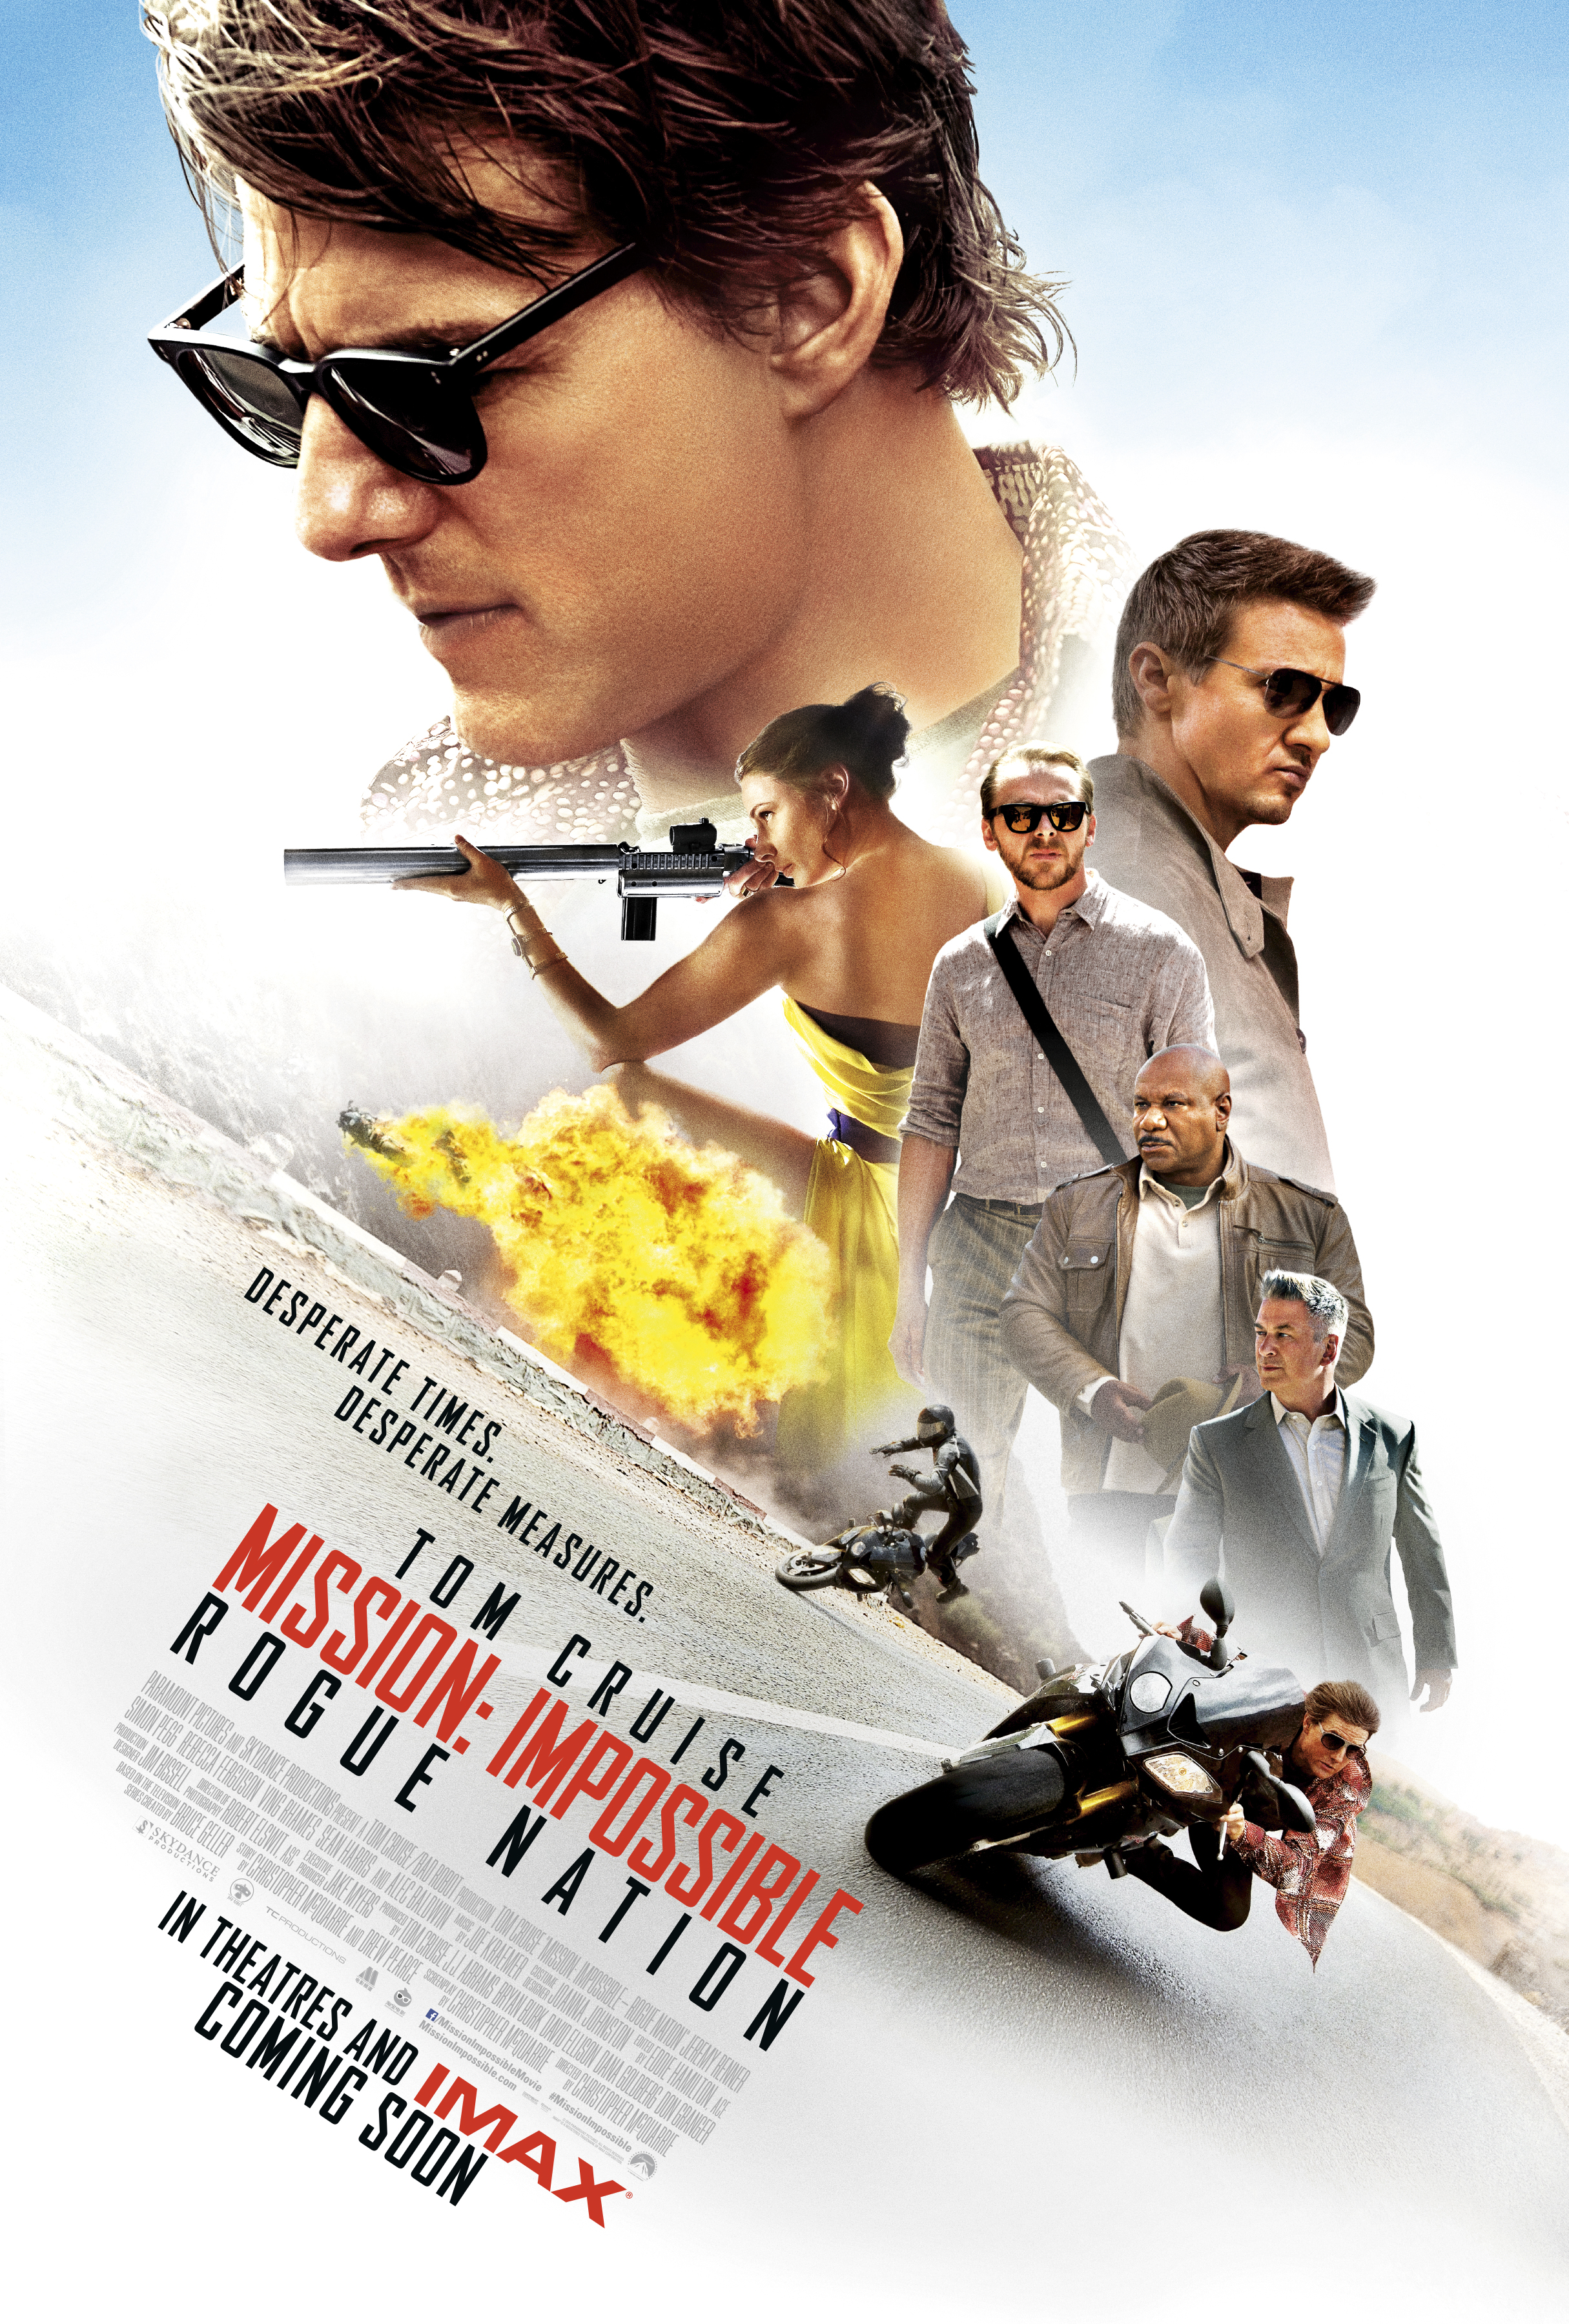 Mission Impossible 5 Kinox